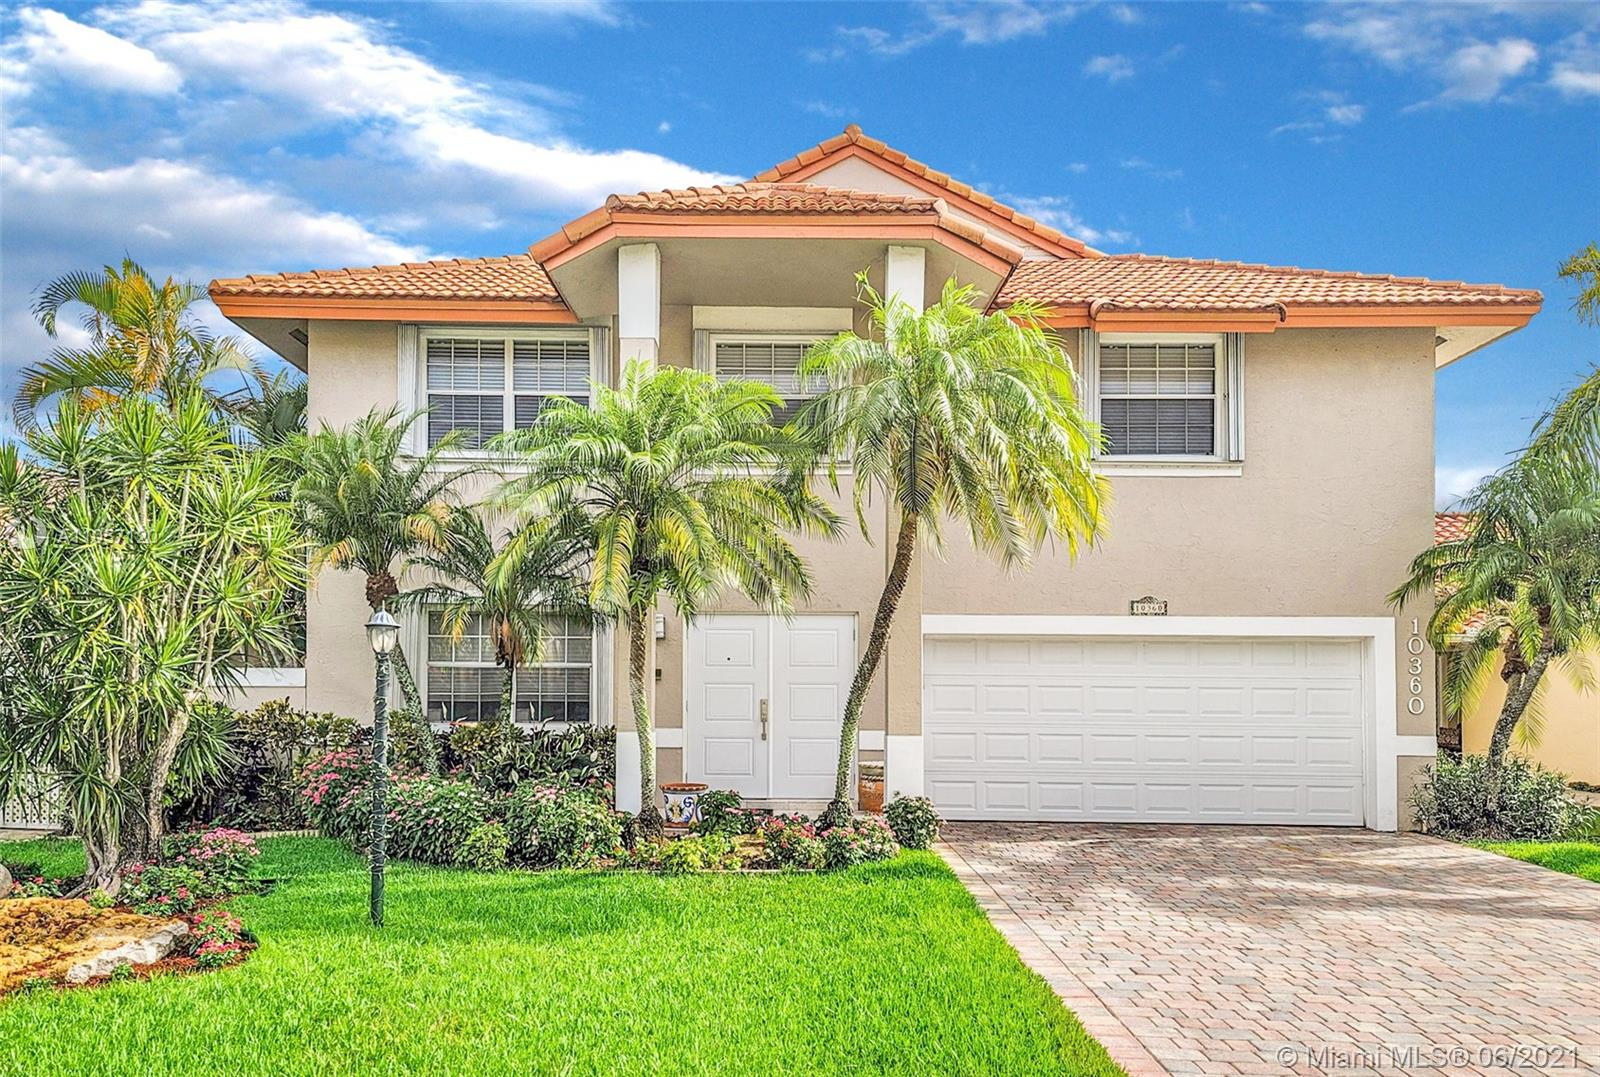 Doral Park - 10360 NW 48th St, Doral, FL 33178